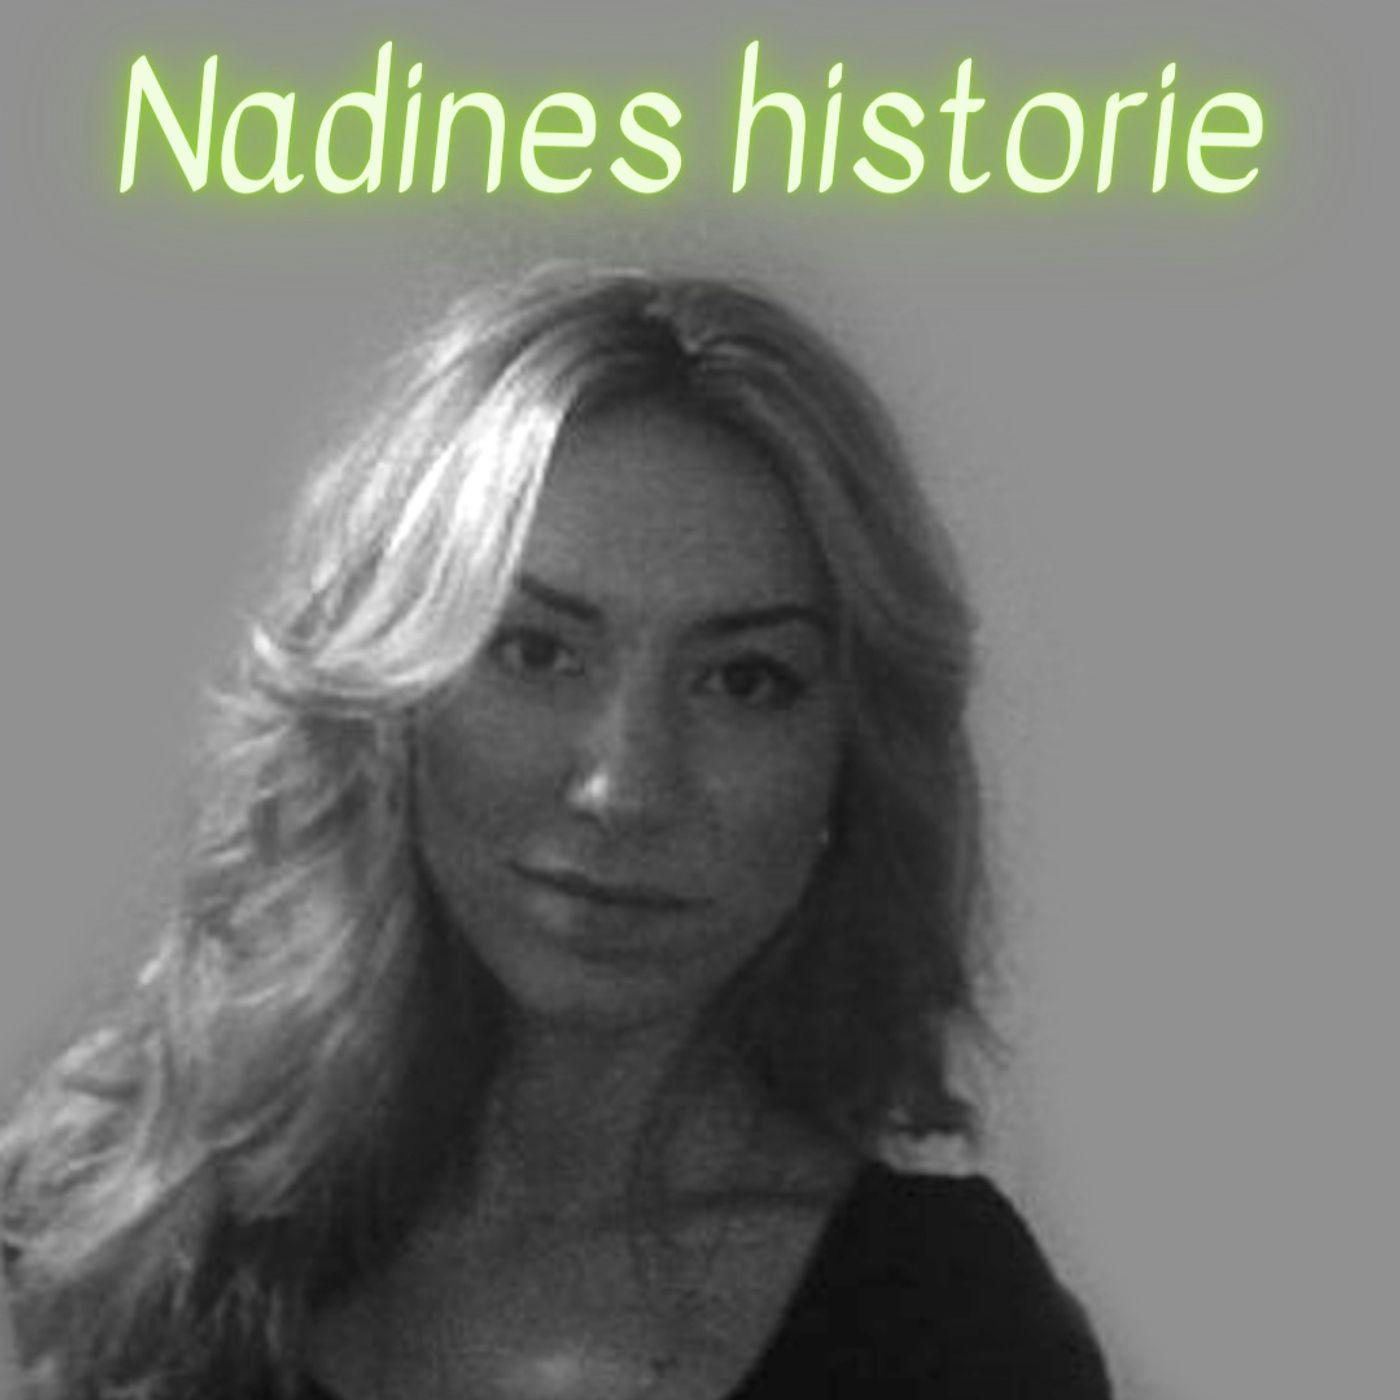 #104 Nadines historie.